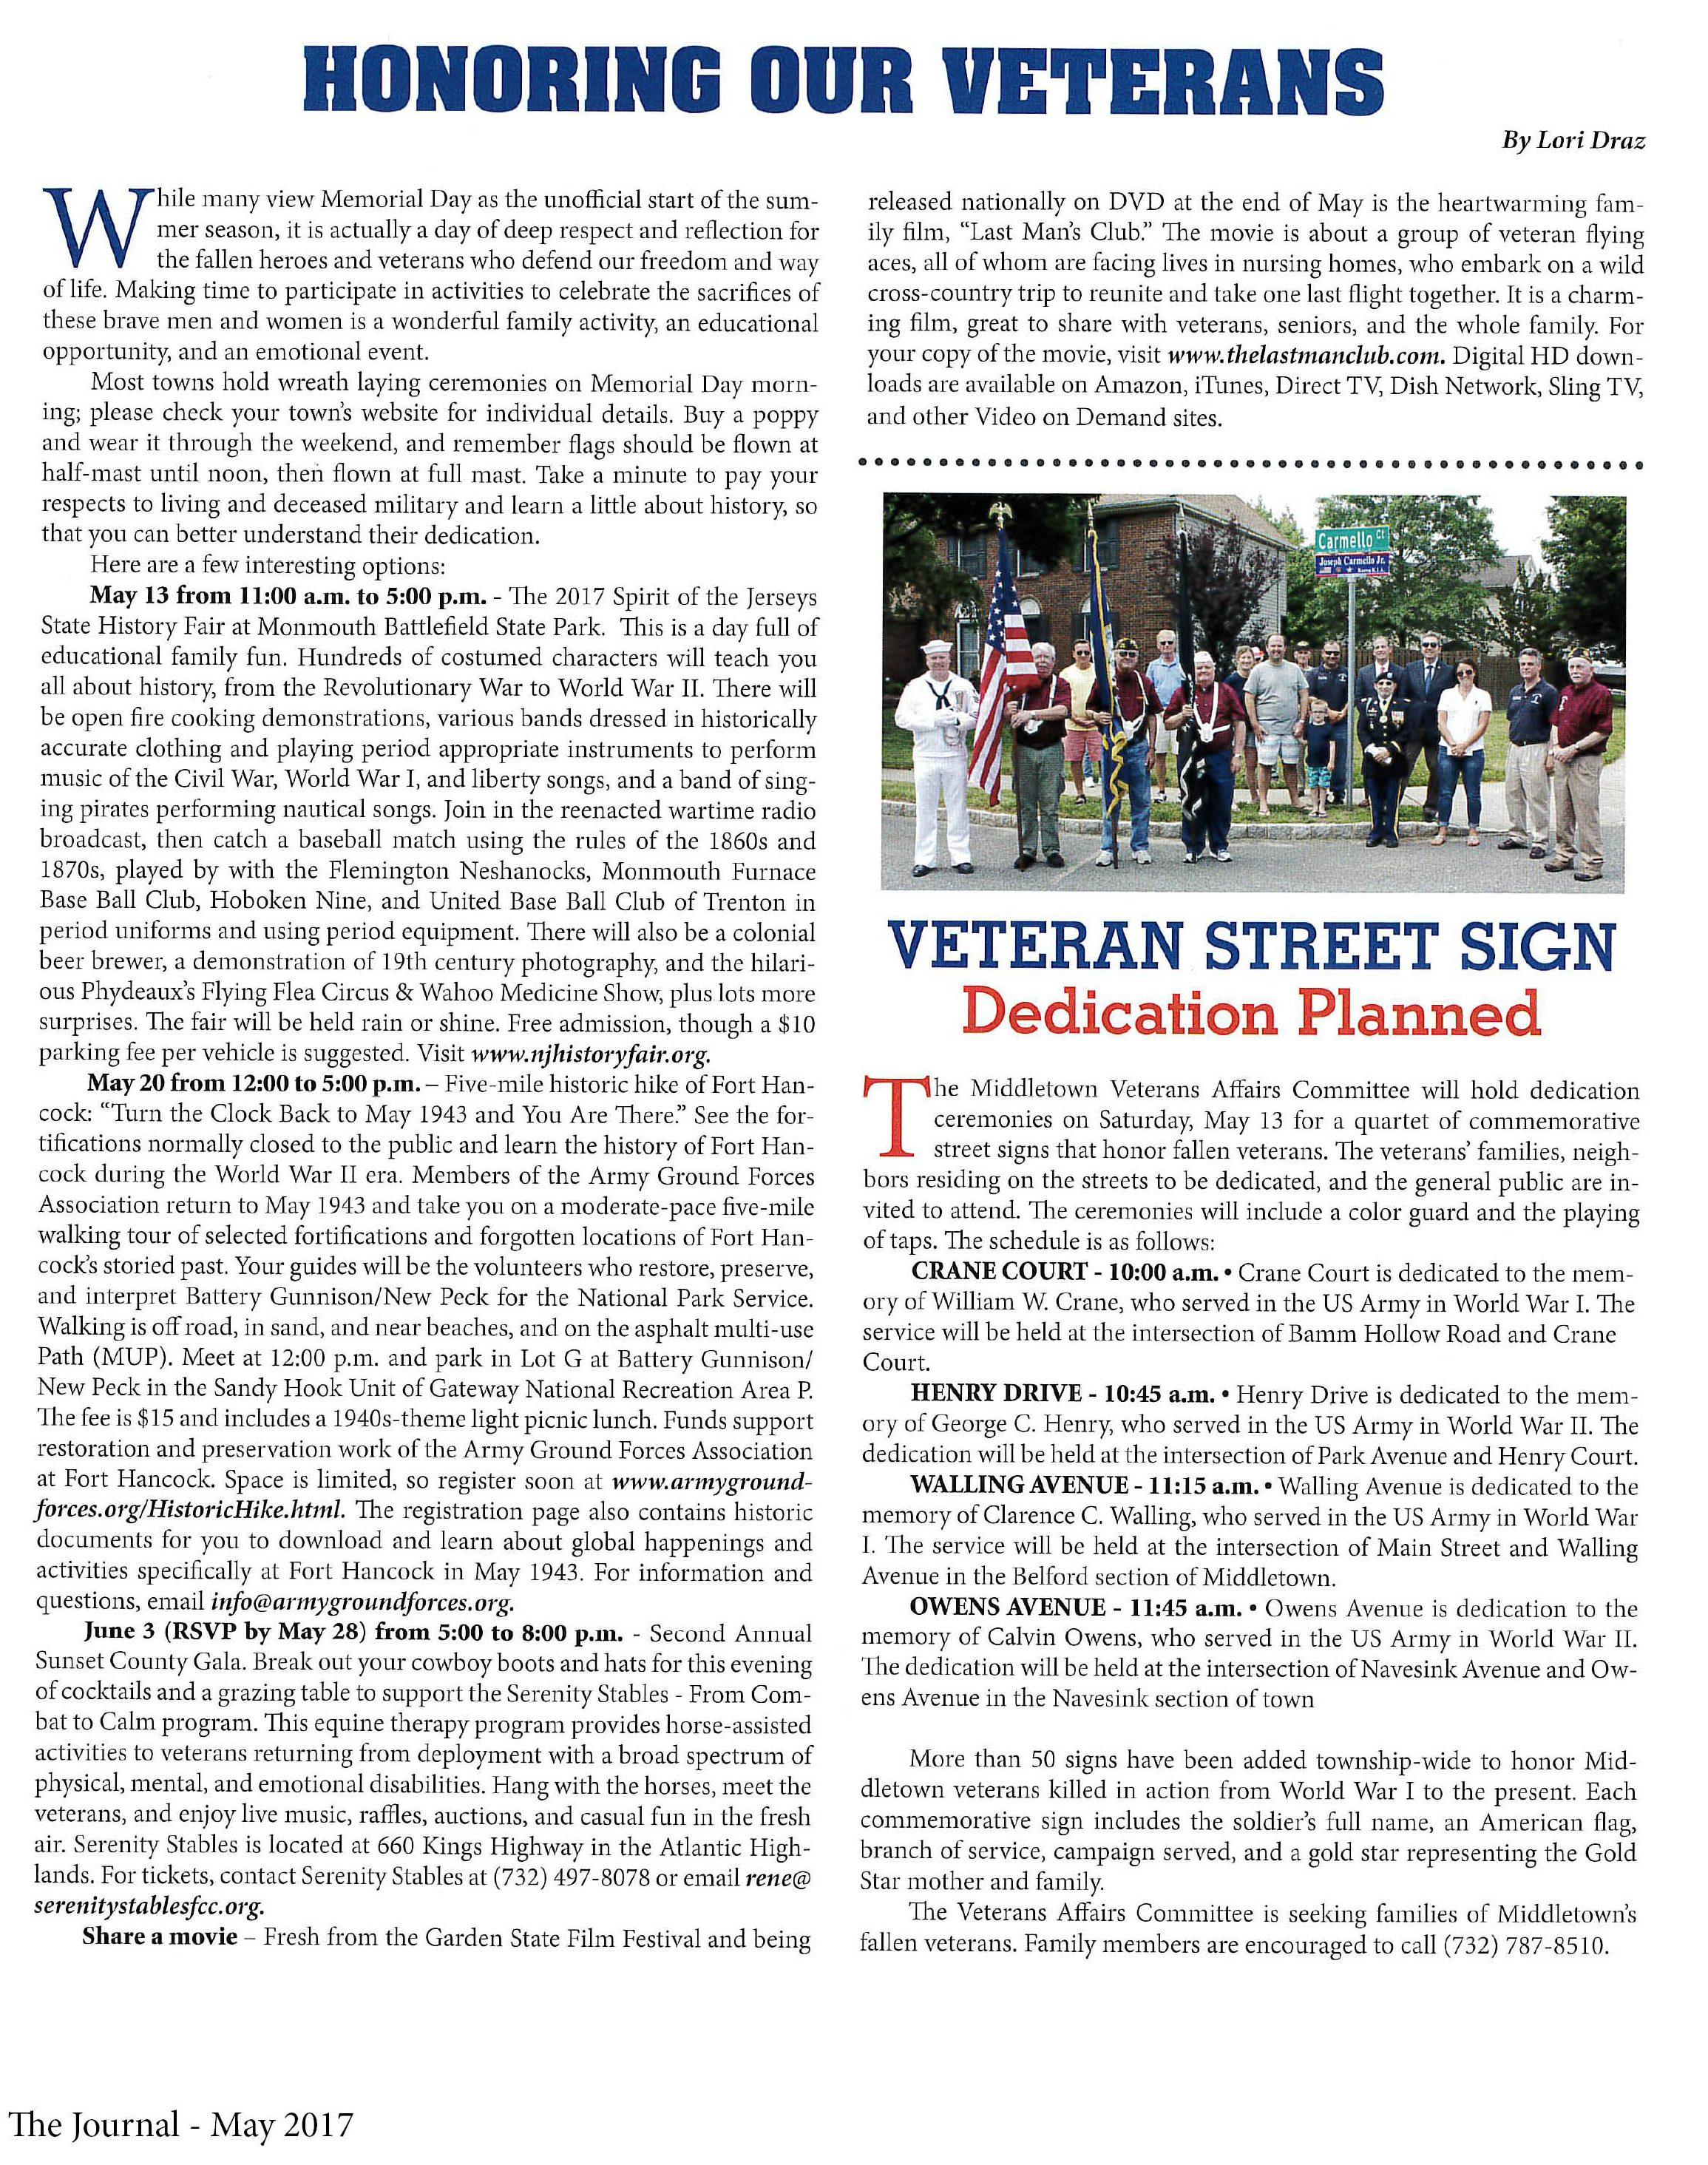 News, The Journal